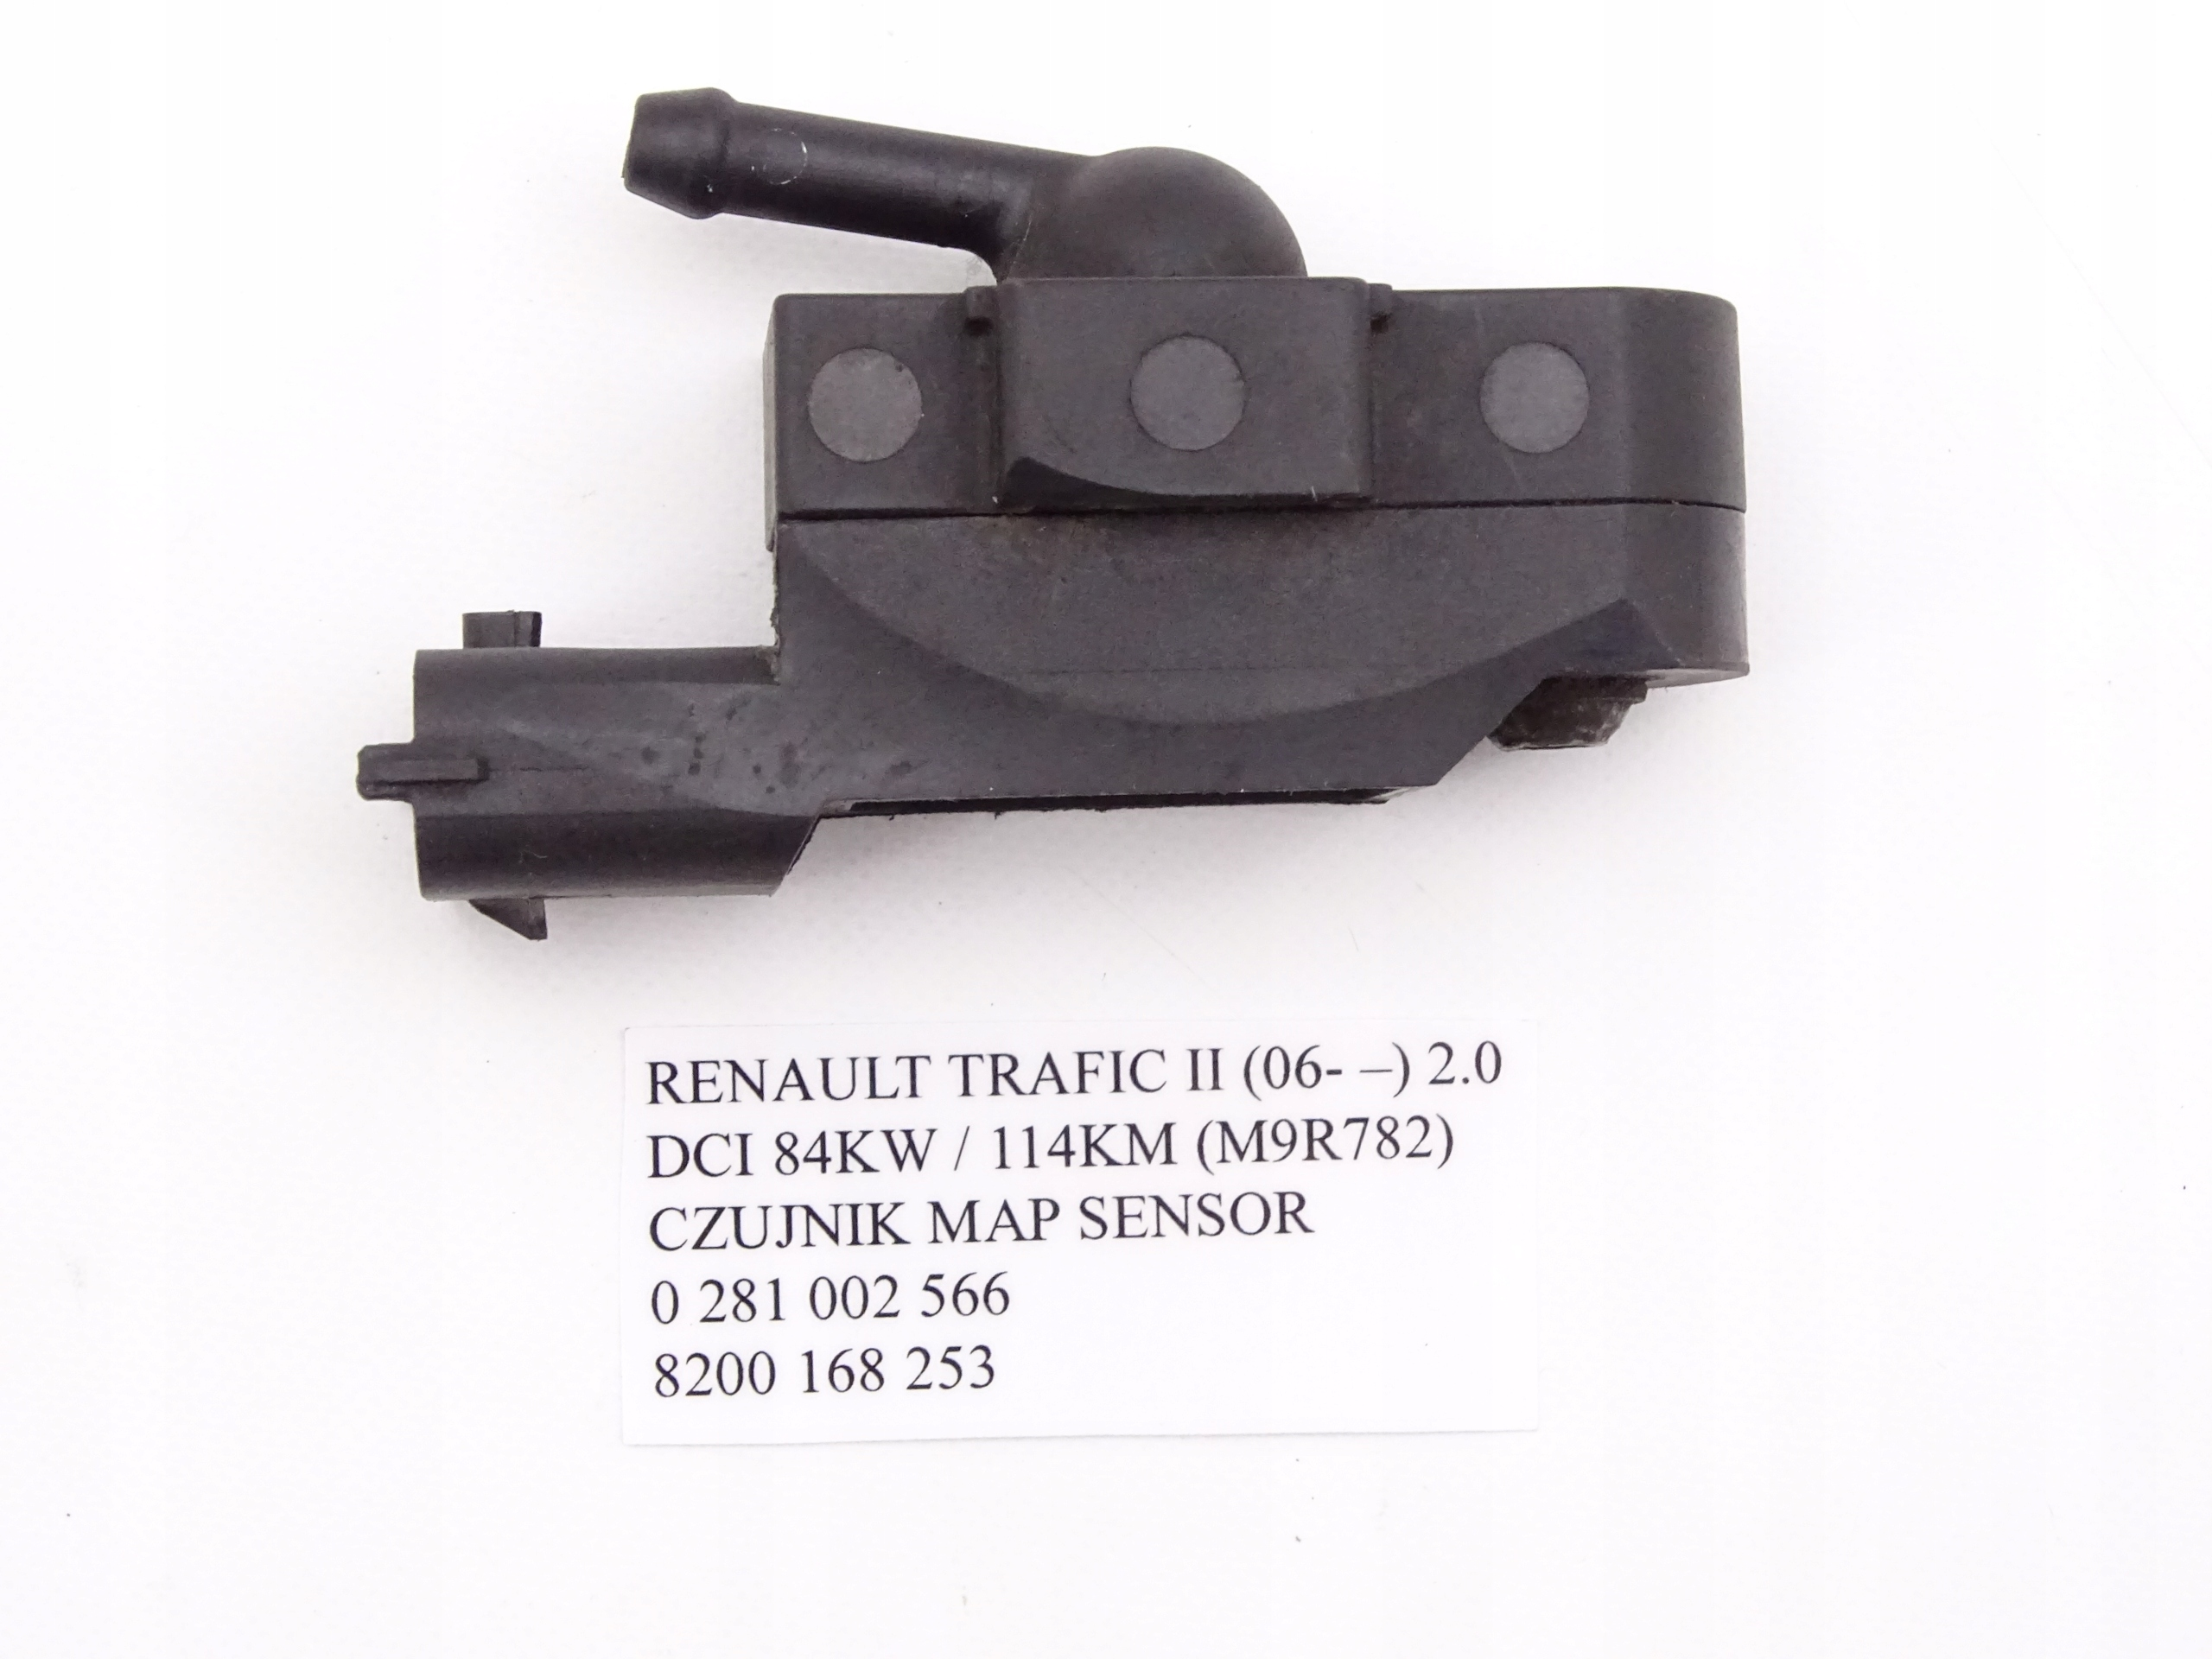 RENAULT TRAFIC II 2 0 DCI @ CZUJNIK MAP SENSOR - 7792983020